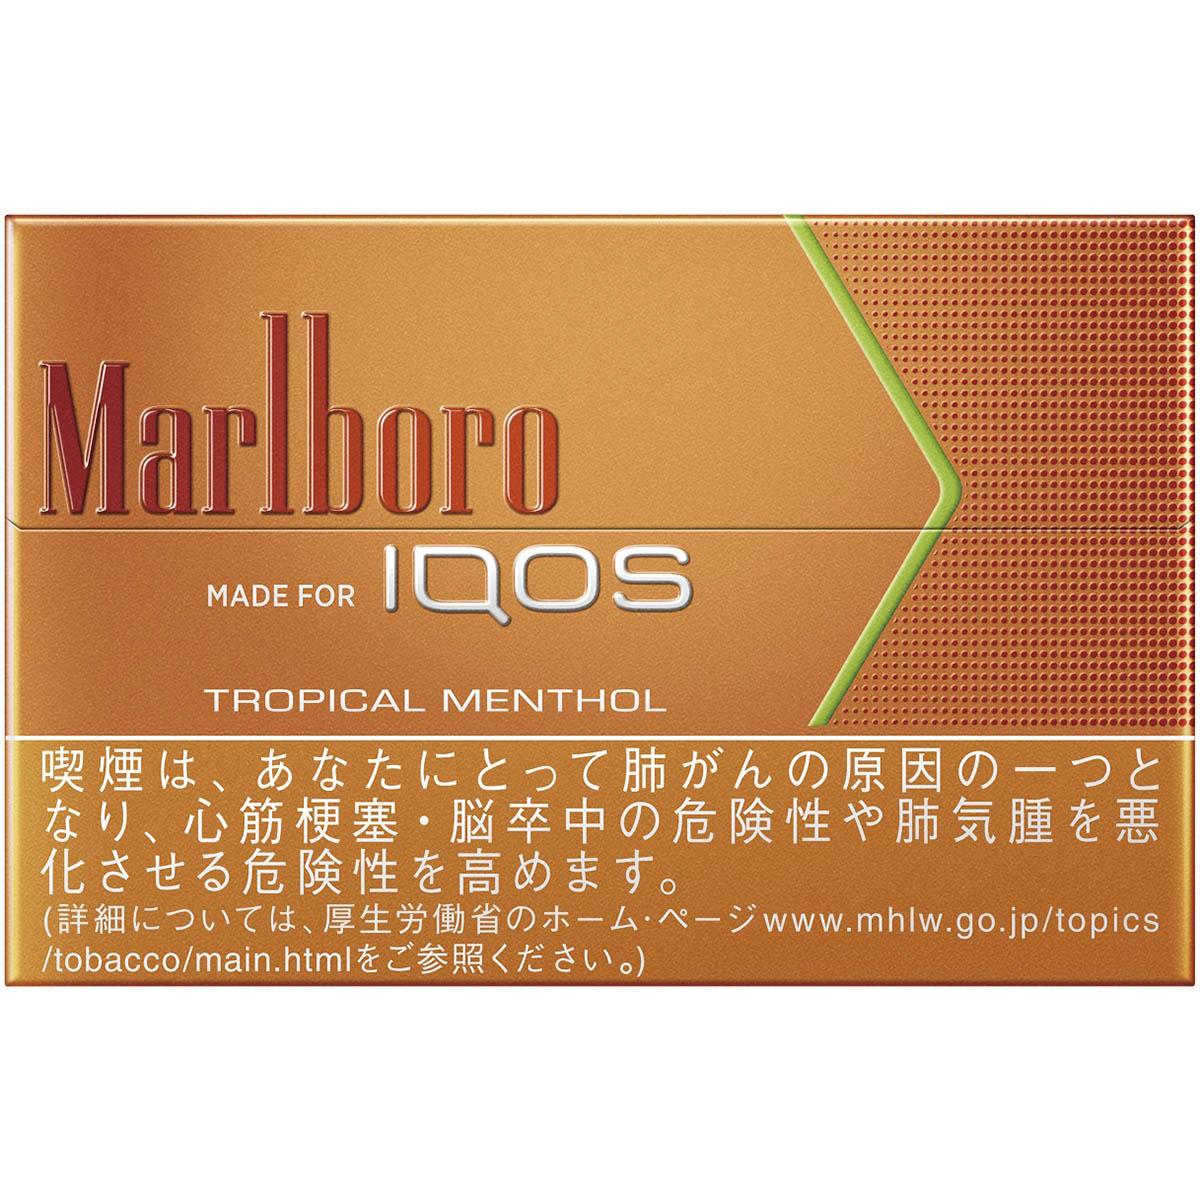 Marlboro - Tropical Menthol